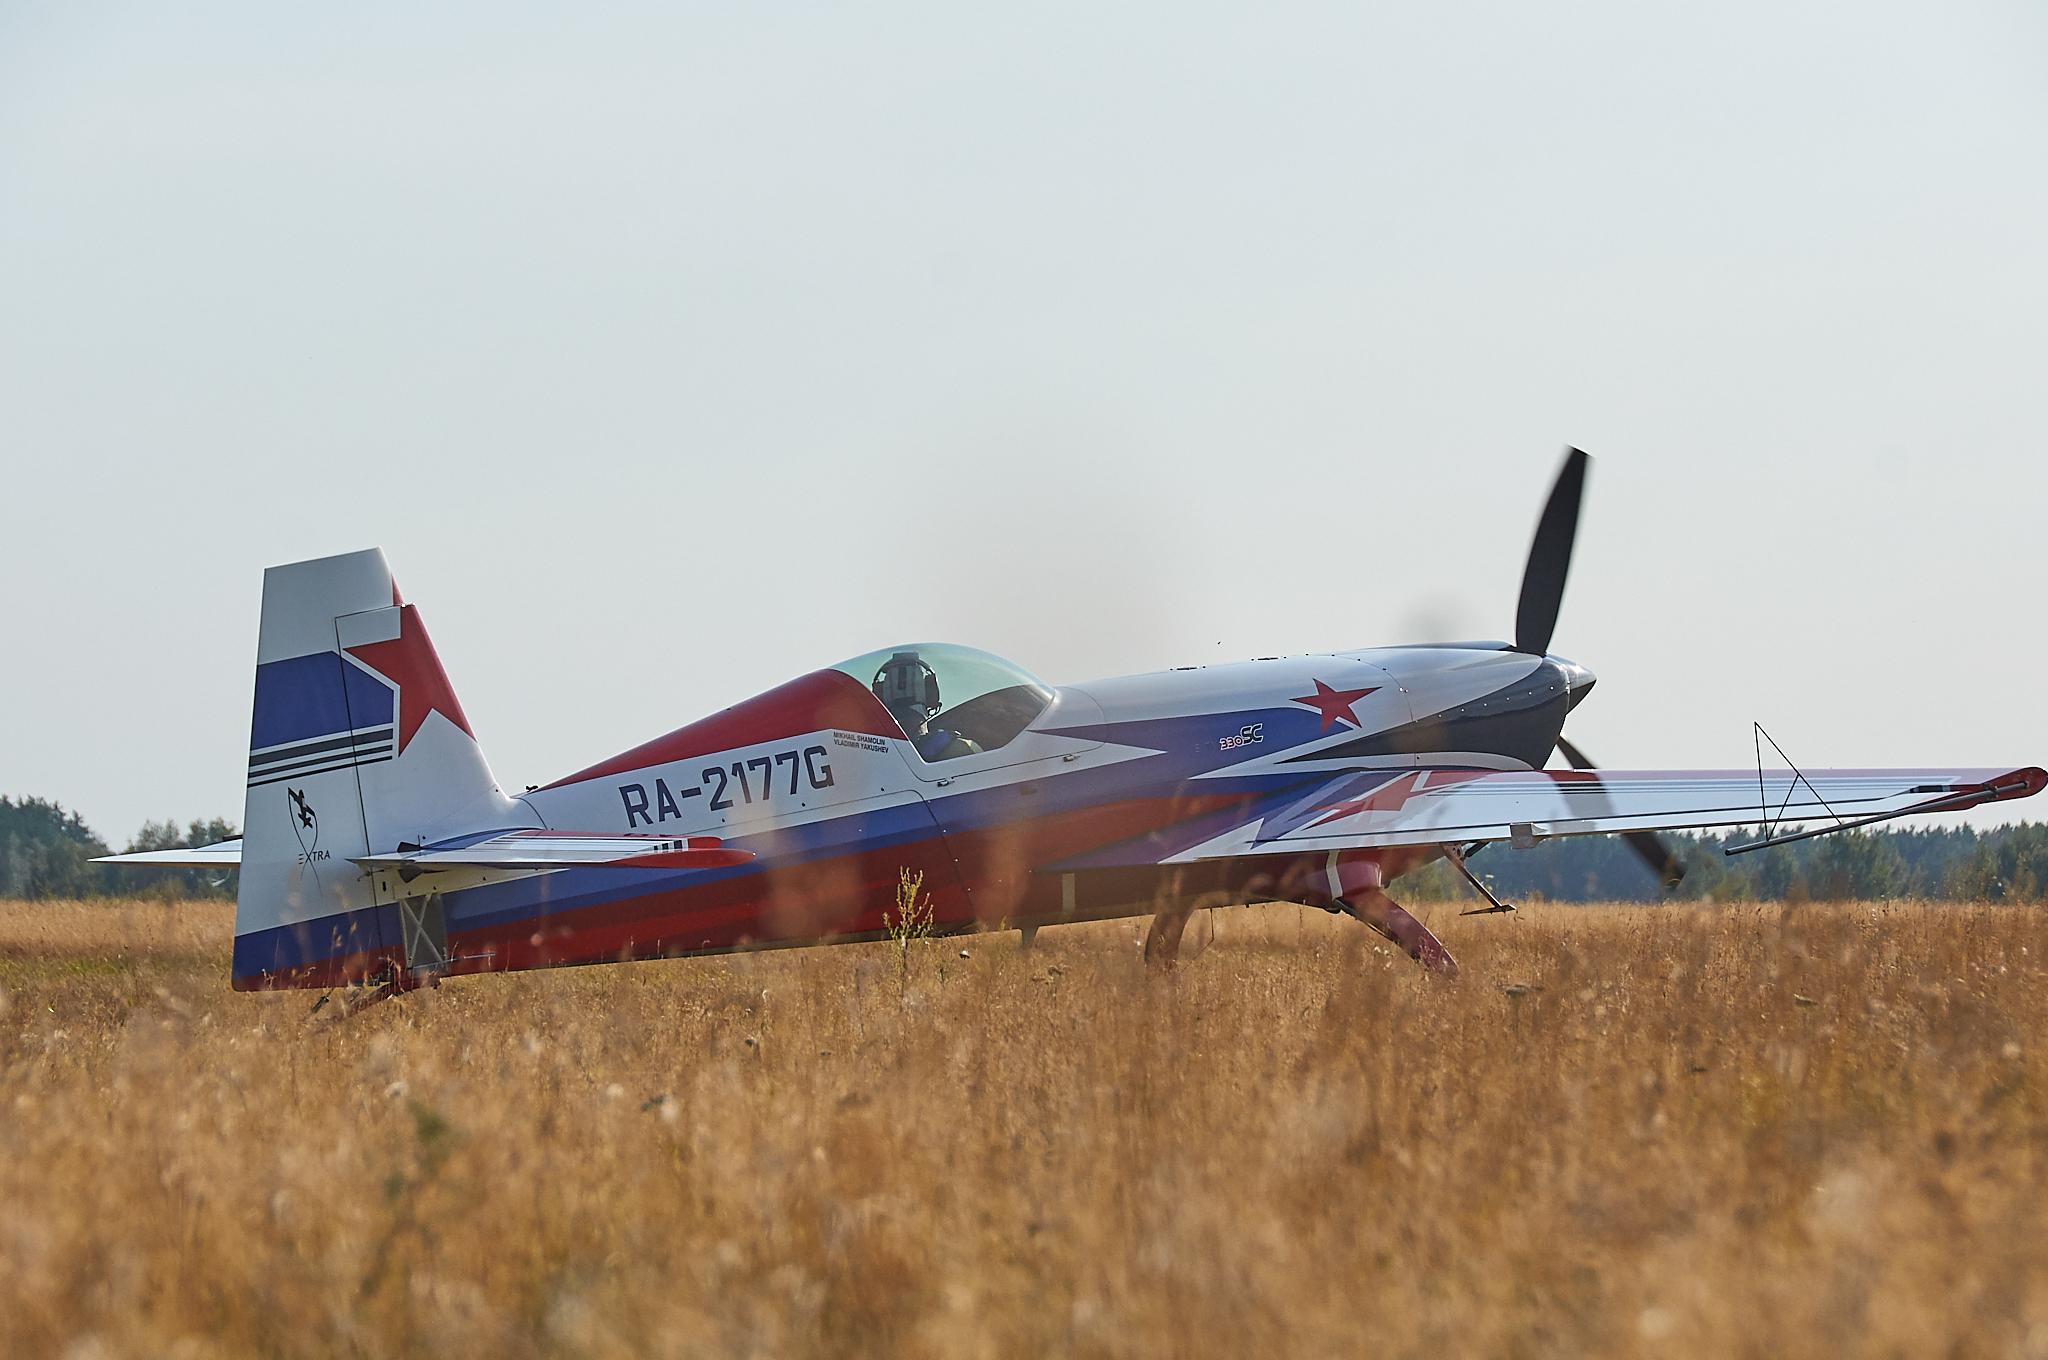 Notes about aerobatic airplane competitions - Заметки о самолётных соревнованиях